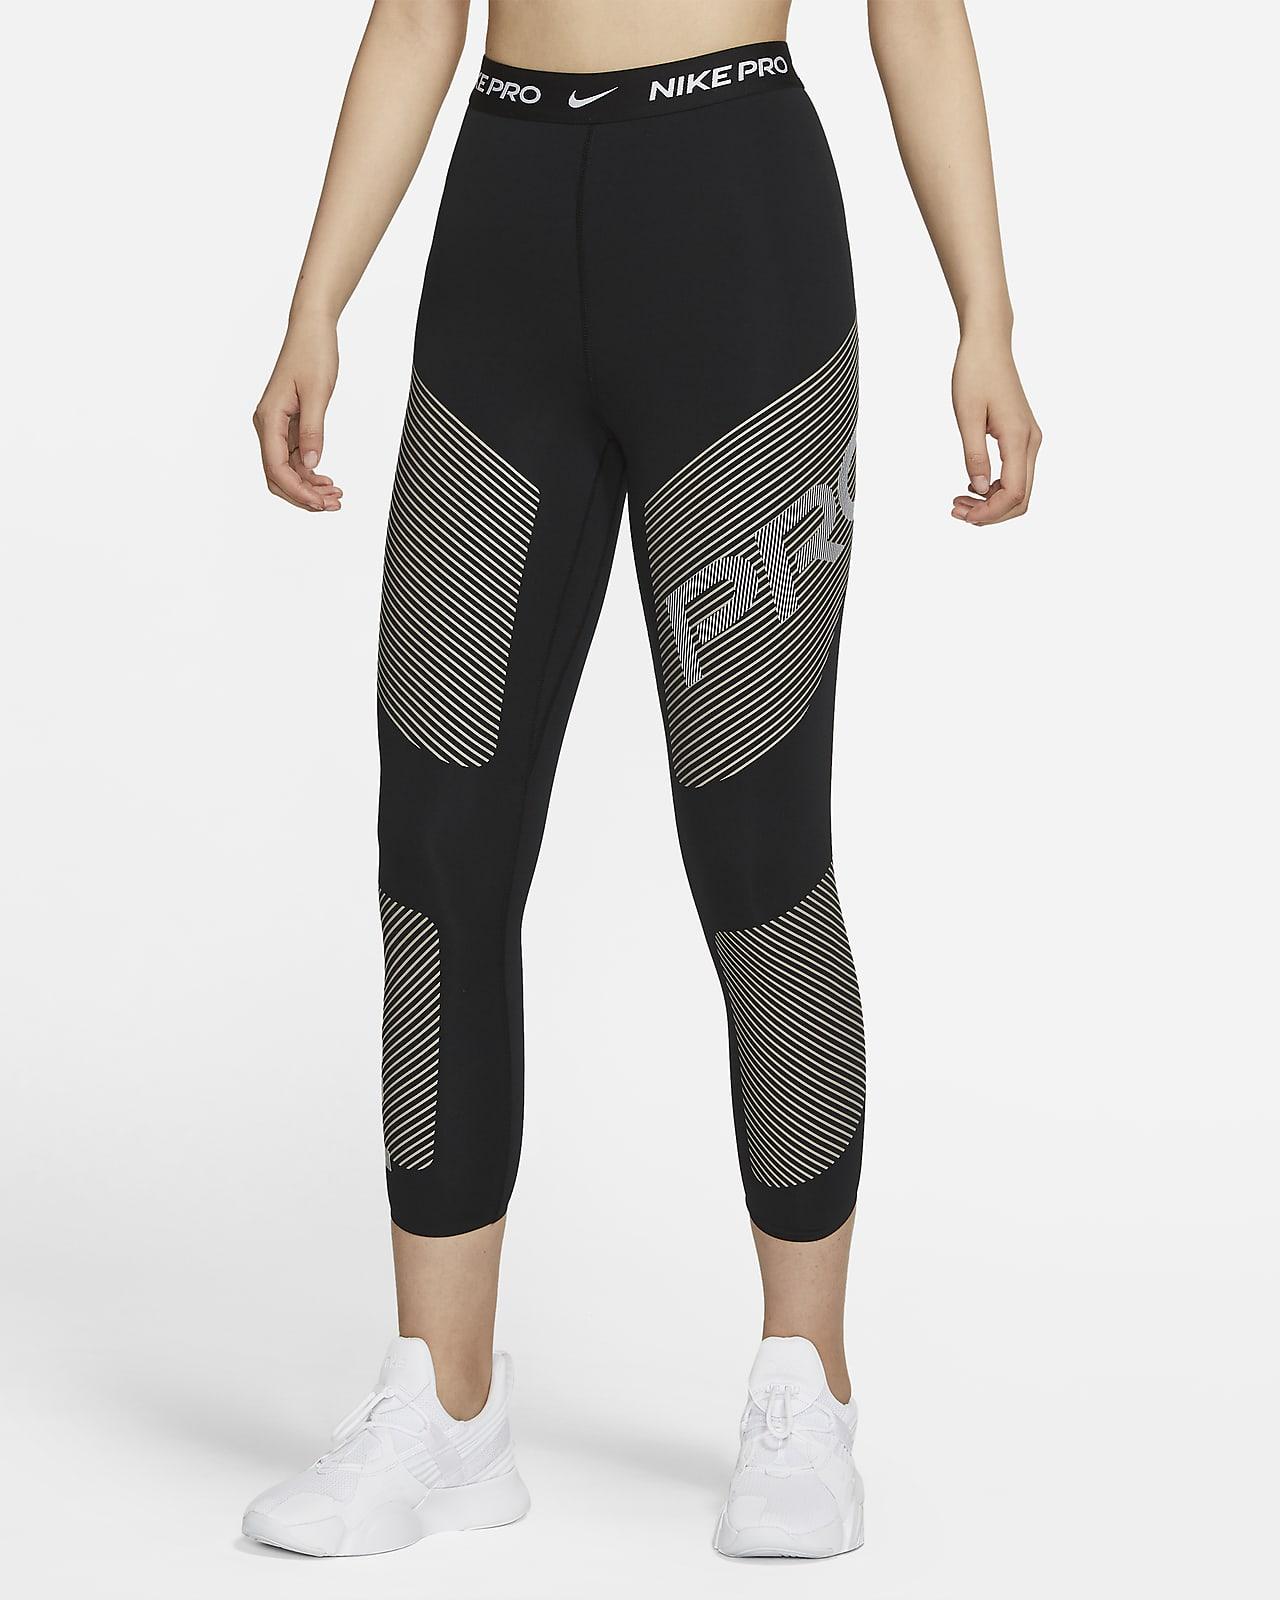 Nike Pro Dri-FIT Women's High-Waisted 7/8 Graphic Leggings